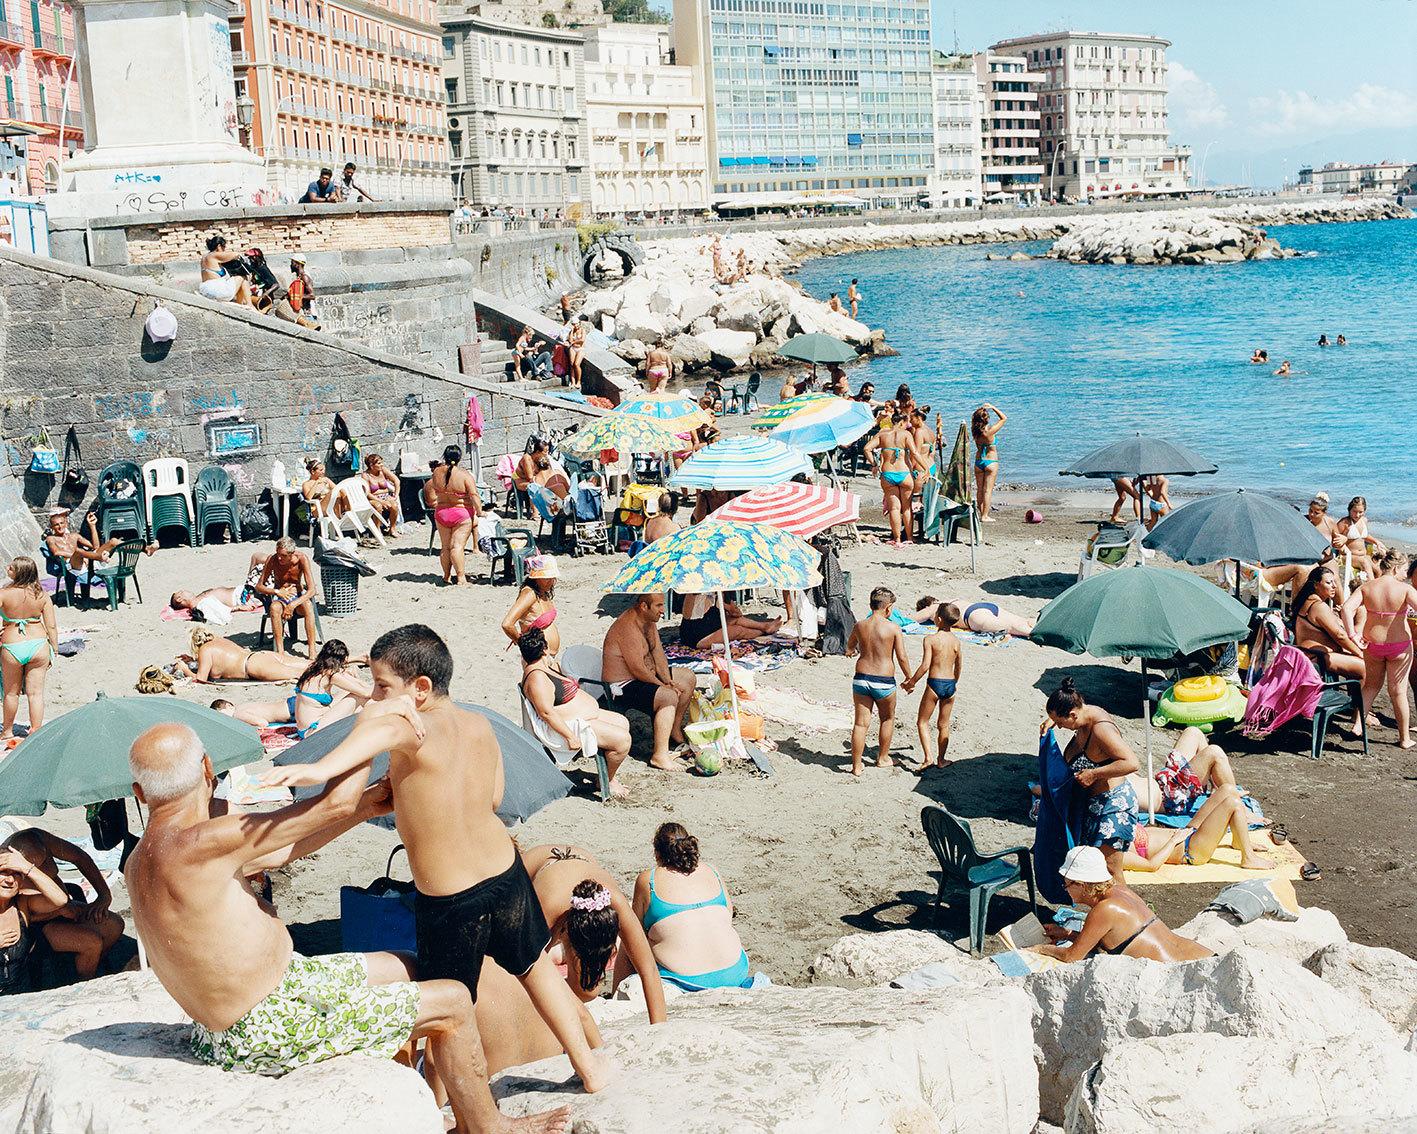 neapolitan summer - neomag.